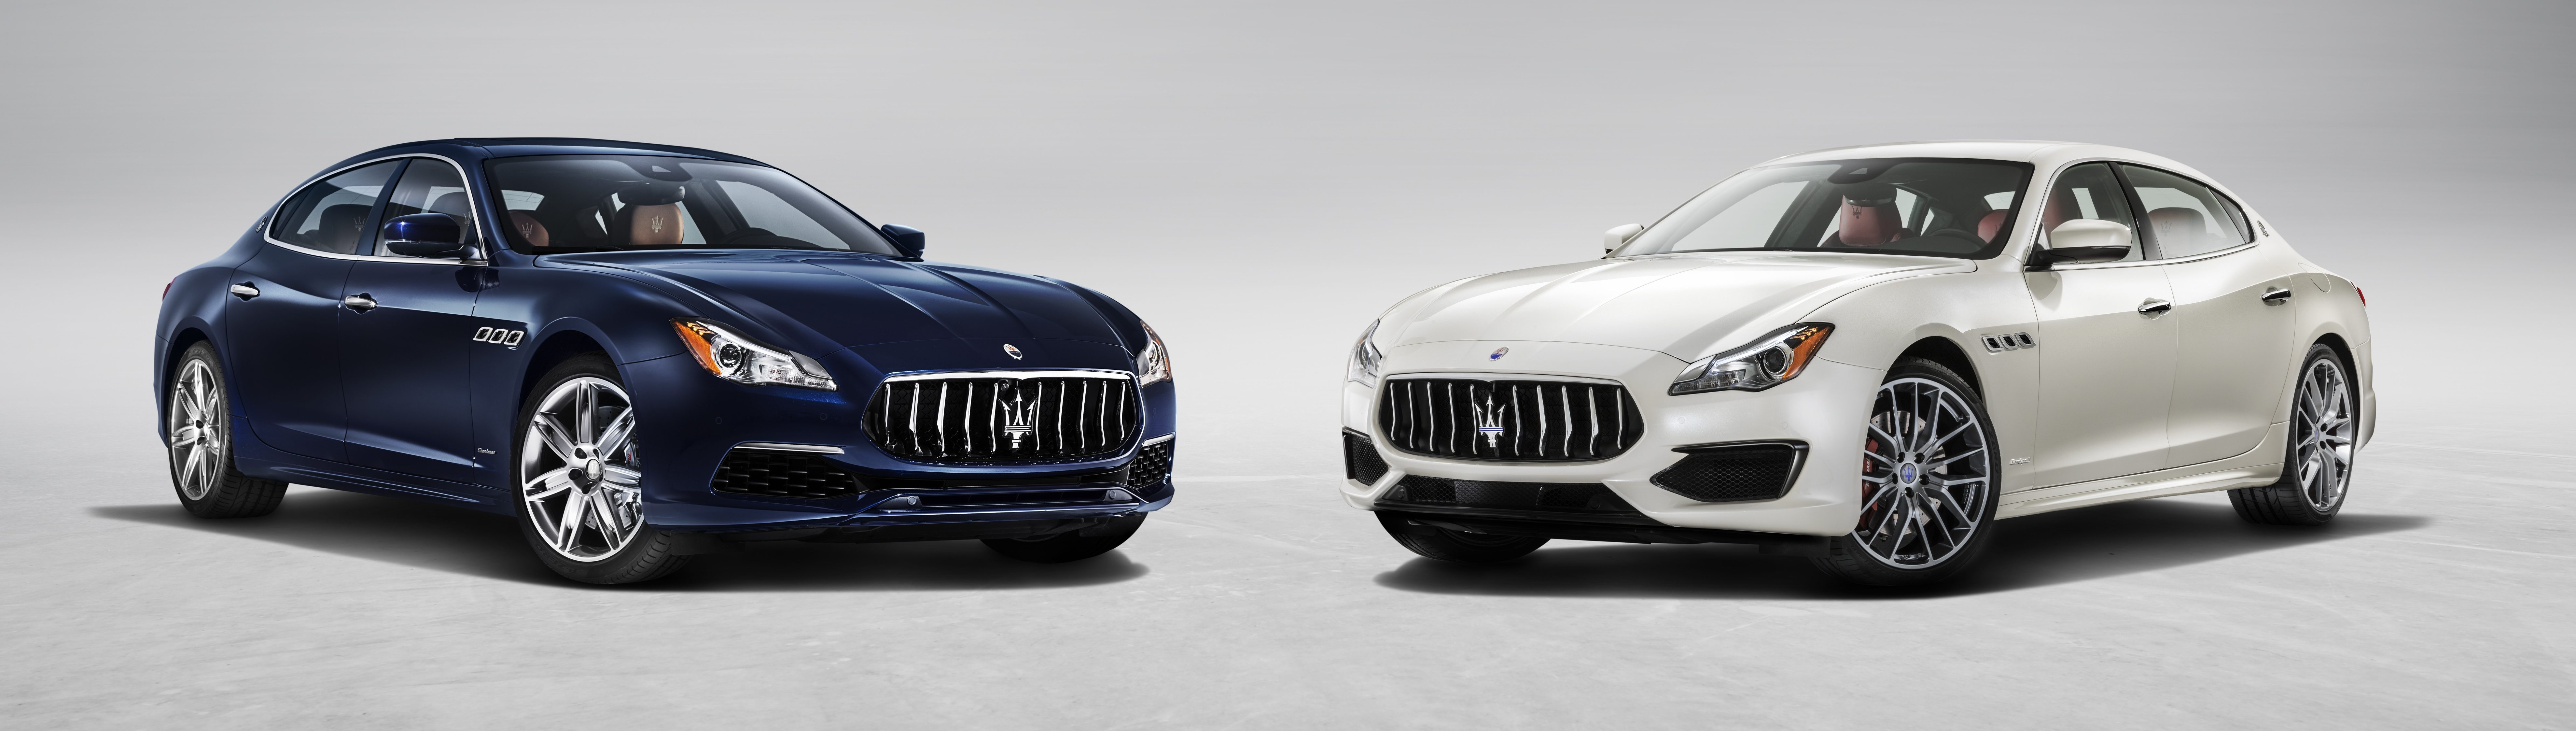 Maserati >> Maserati Quattroporte facelift gains revised looks, tech Paul Tan - Image 507904